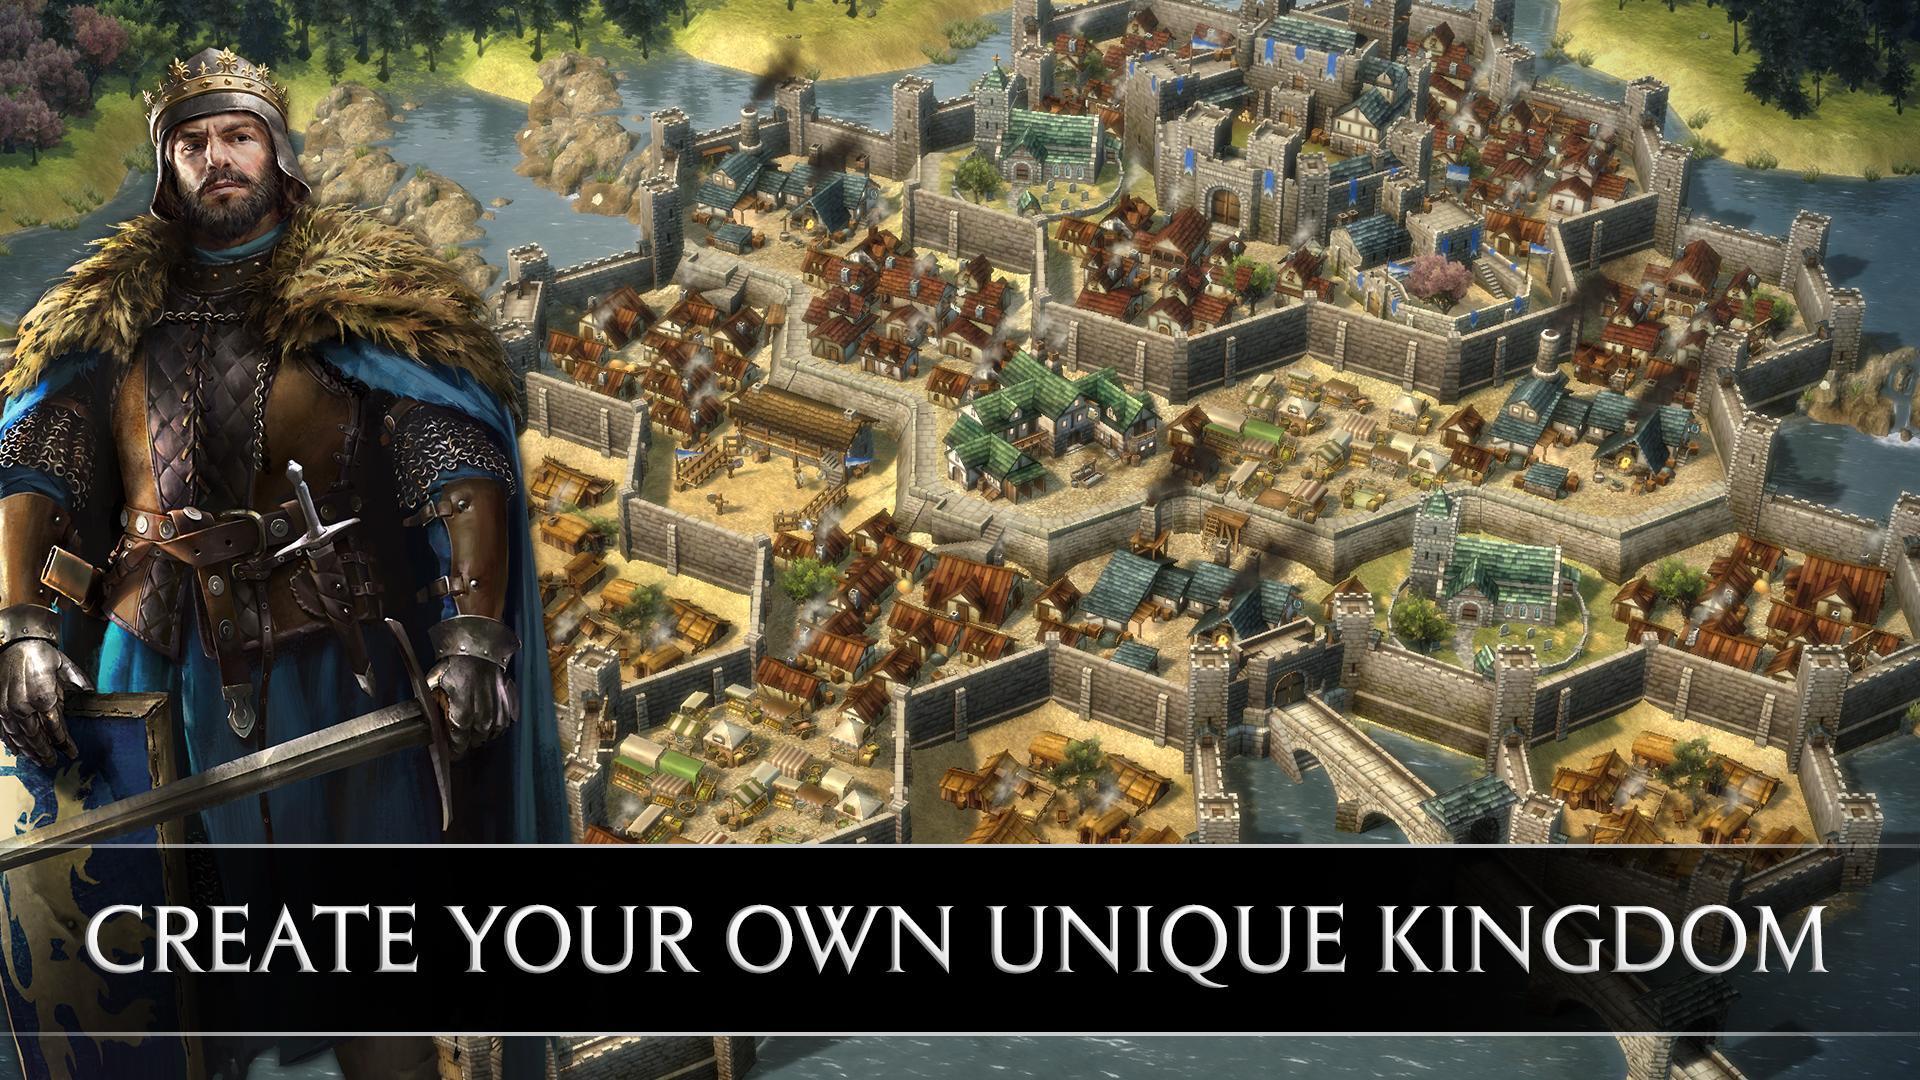 Total War Battles: KINGDOM - Strategy RPG 1.30 Screenshot 7